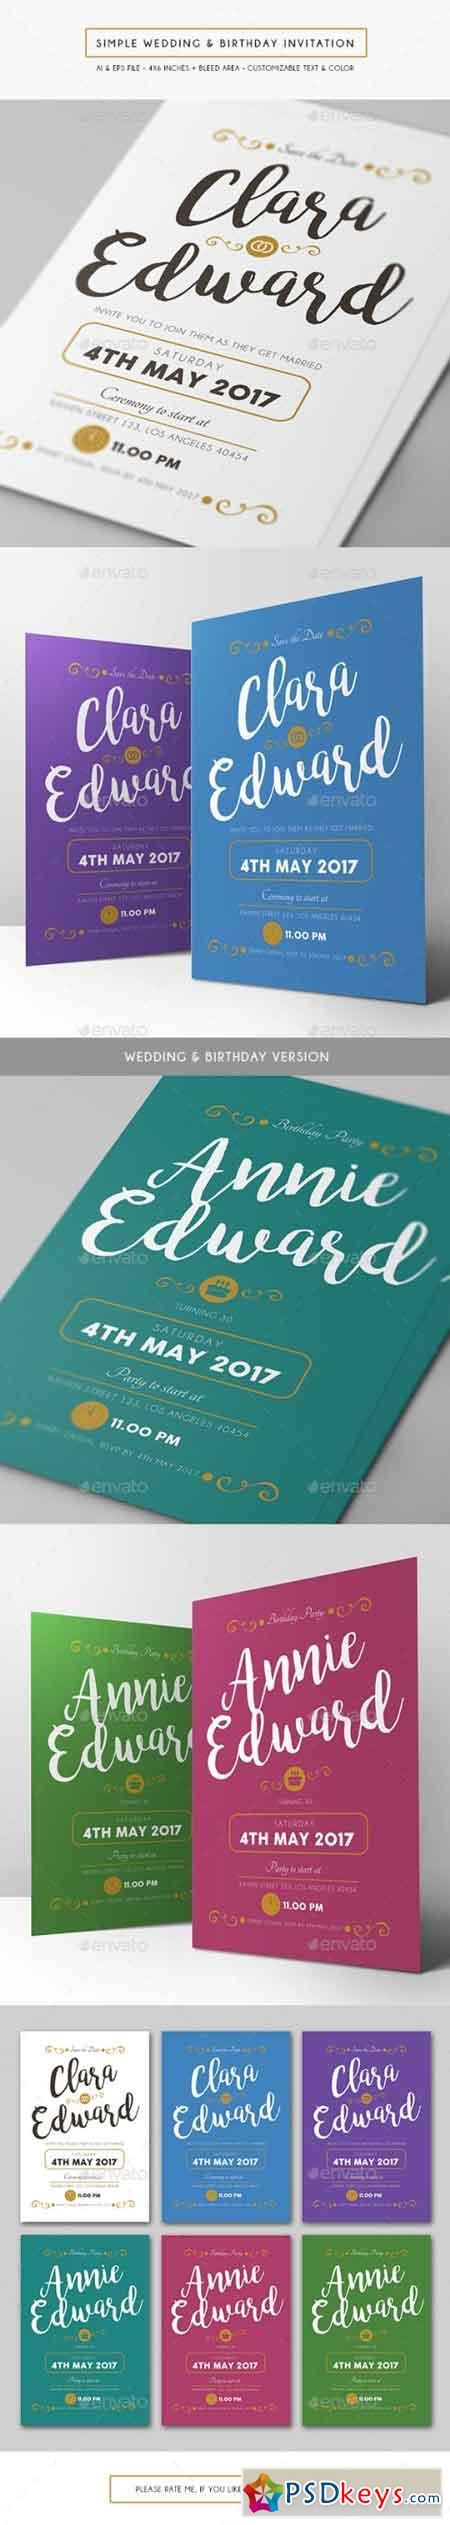 Simple Wedding & Birthday Invitation 15724115